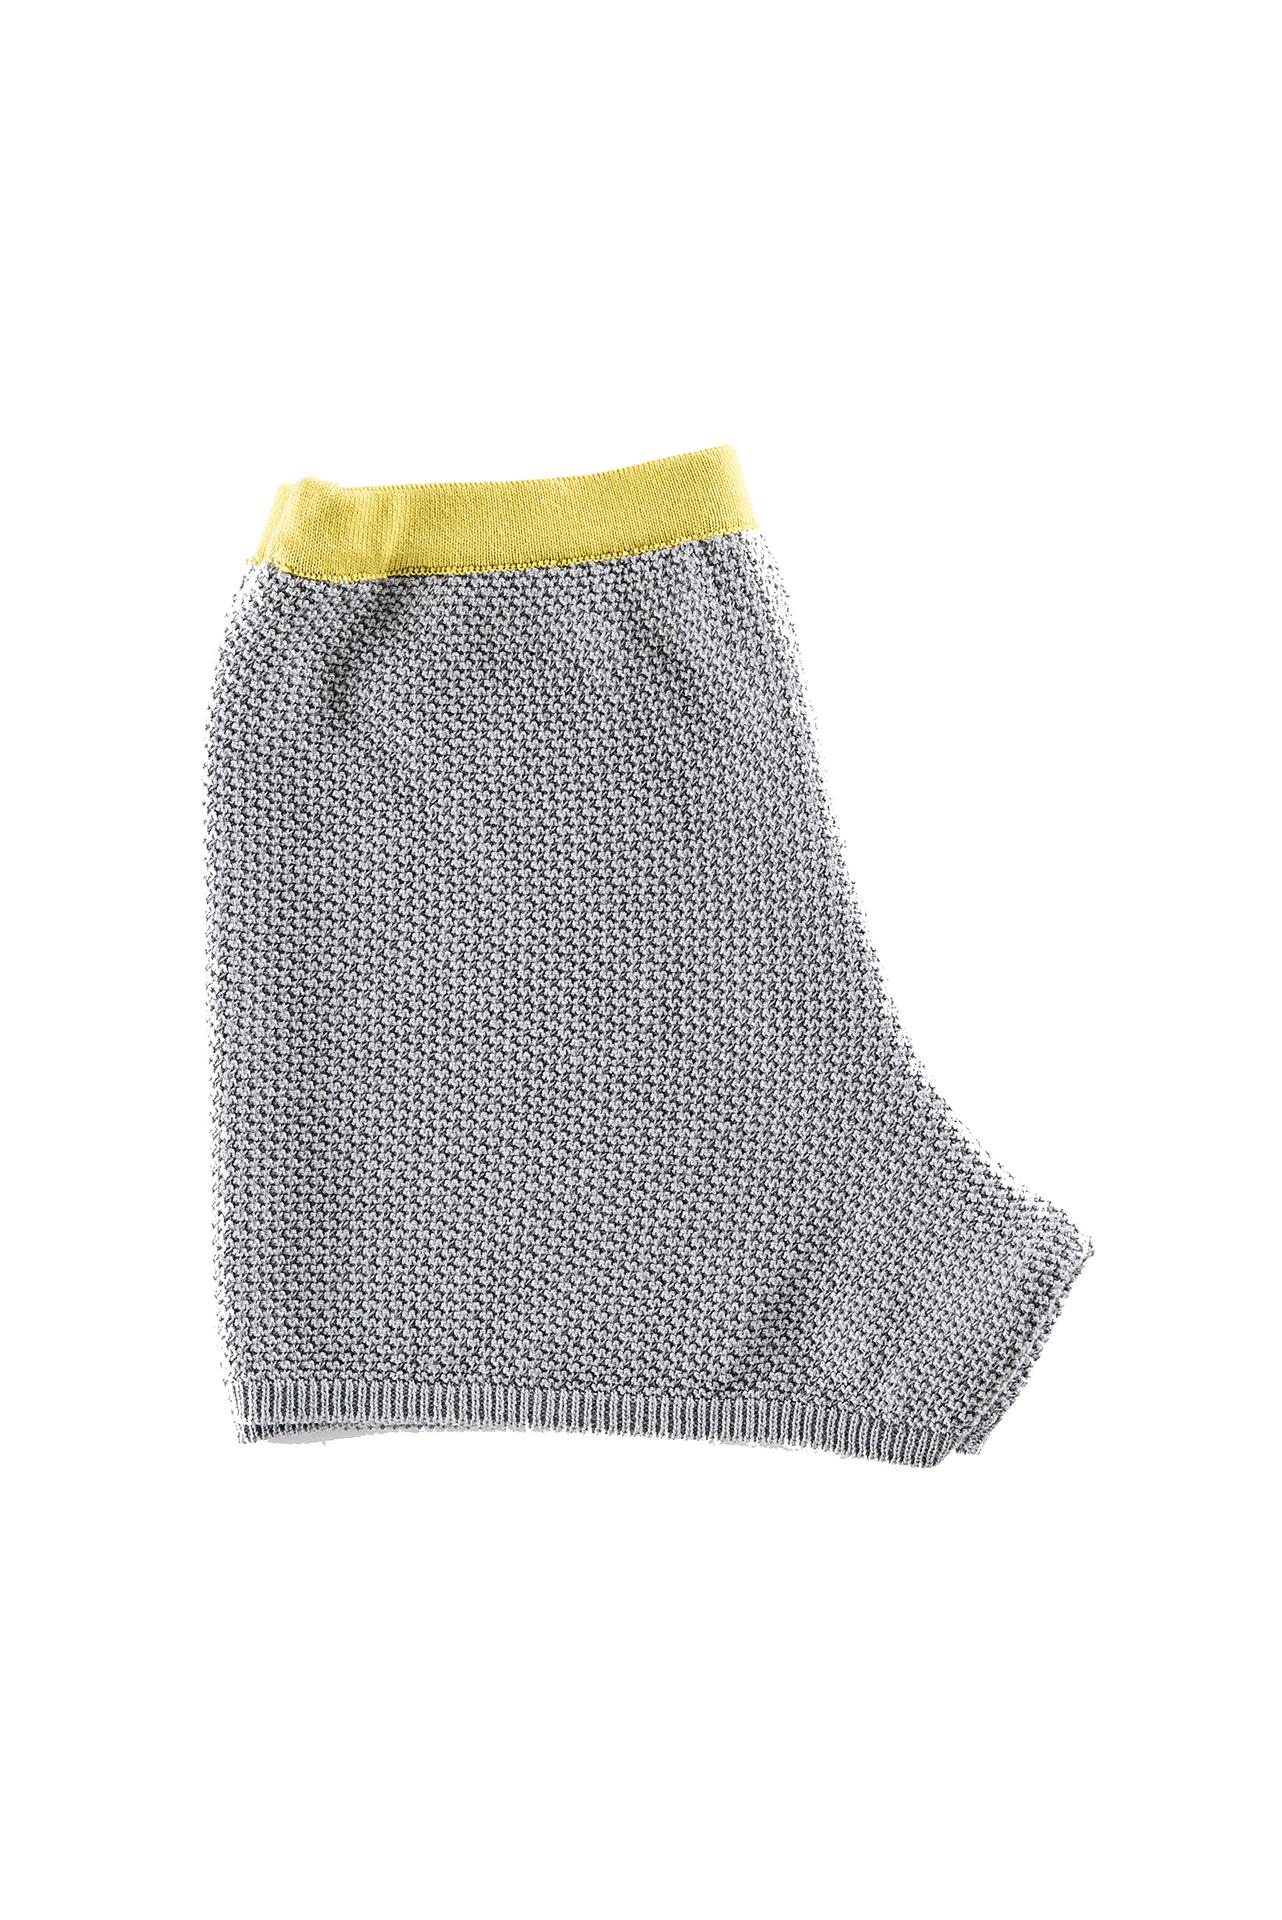 ALGORRI lemon grey short